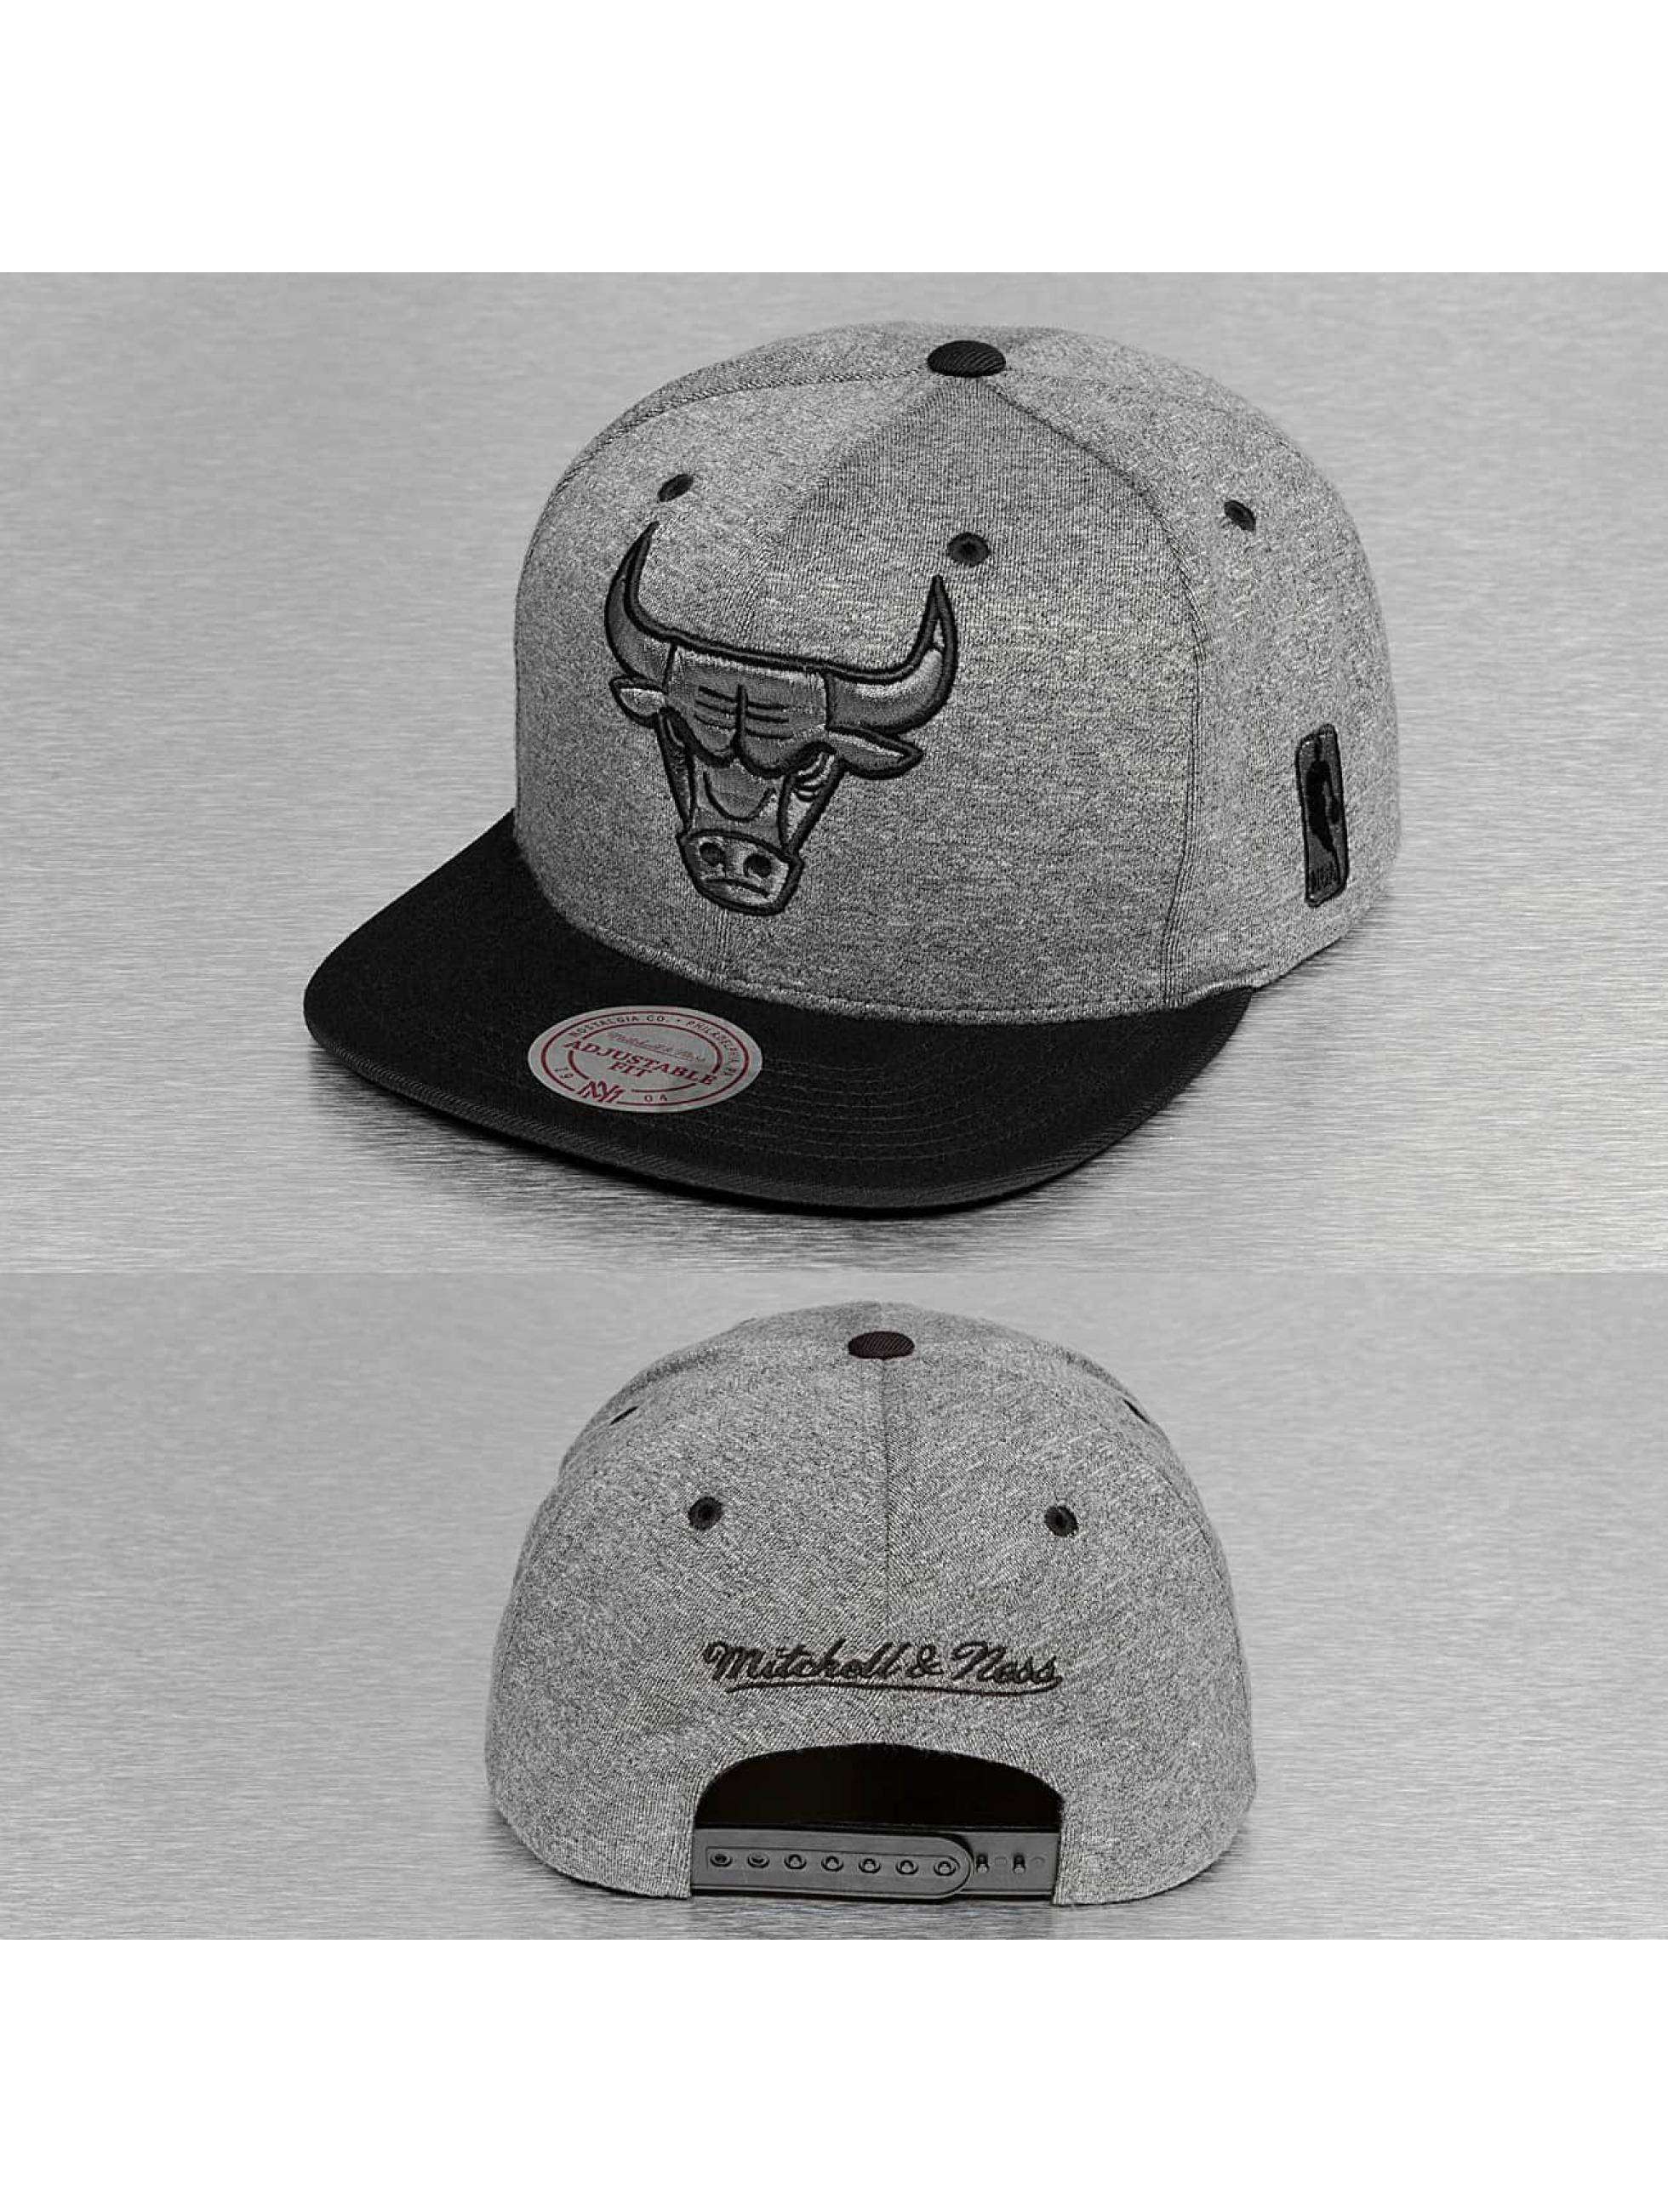 Mitchell & Ness Männer,Frauen Snapback Cap Broad Chicago Bulls in grau